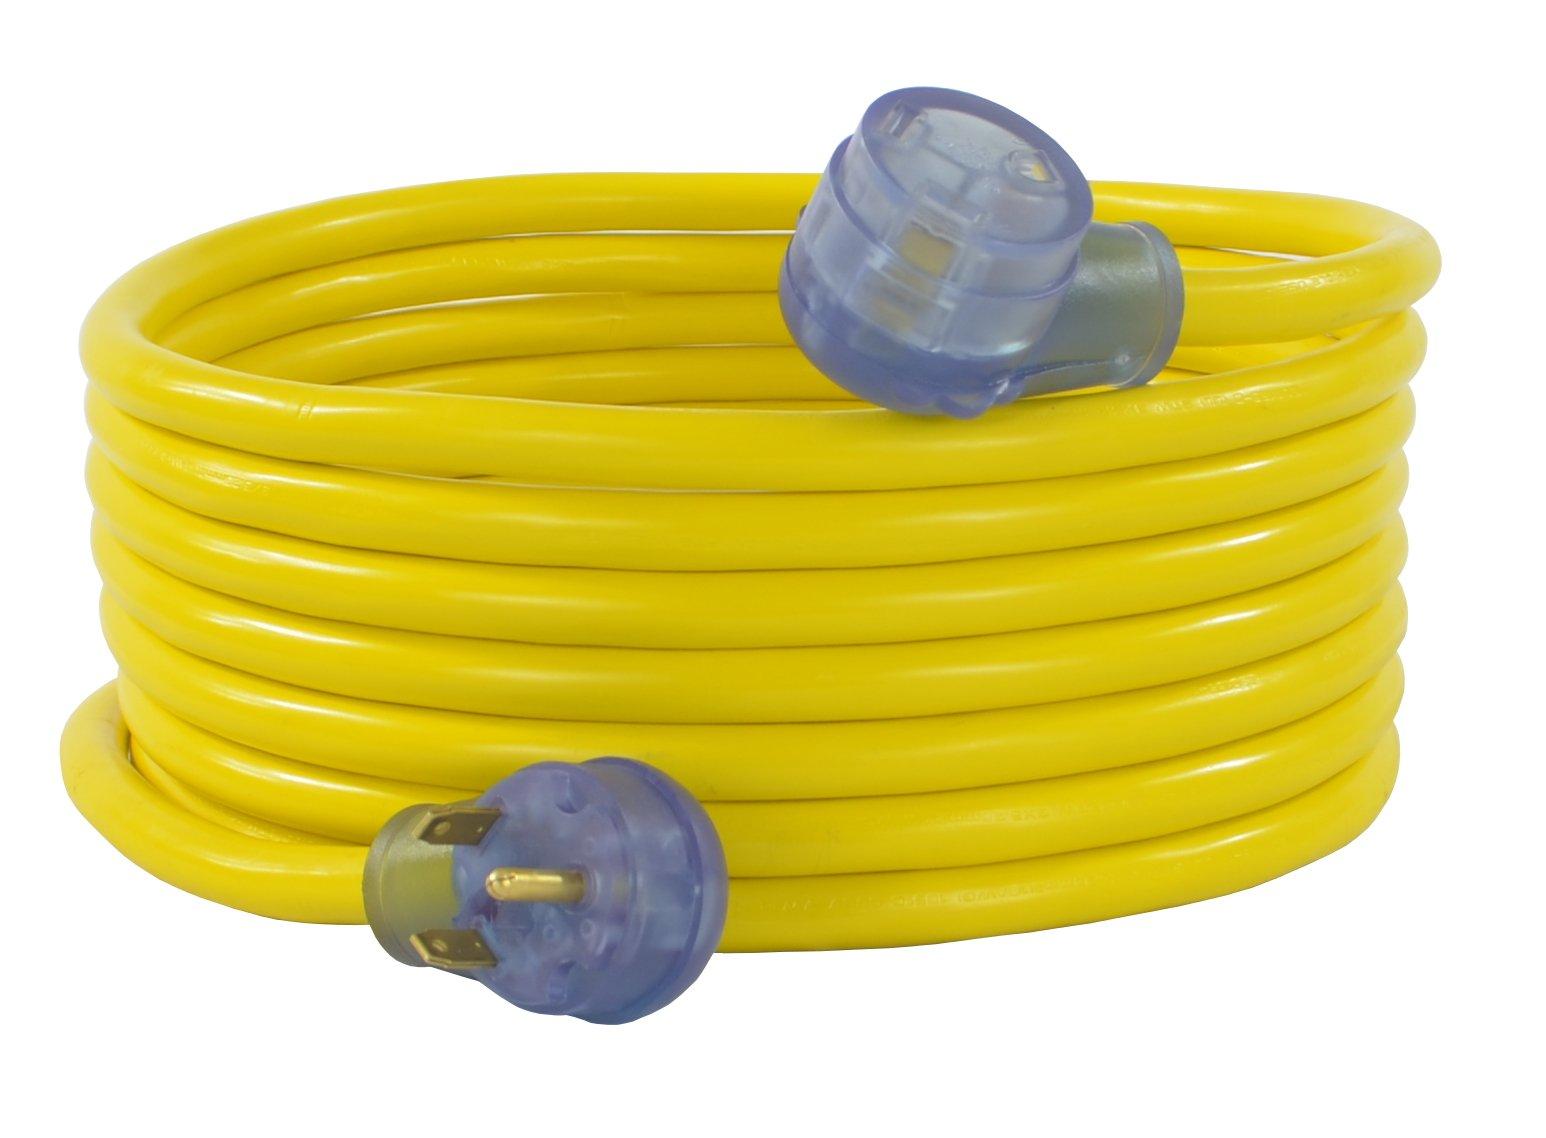 Conntek 14368, 30 Amp RV Extension Cord, Yellow (25-Feet)